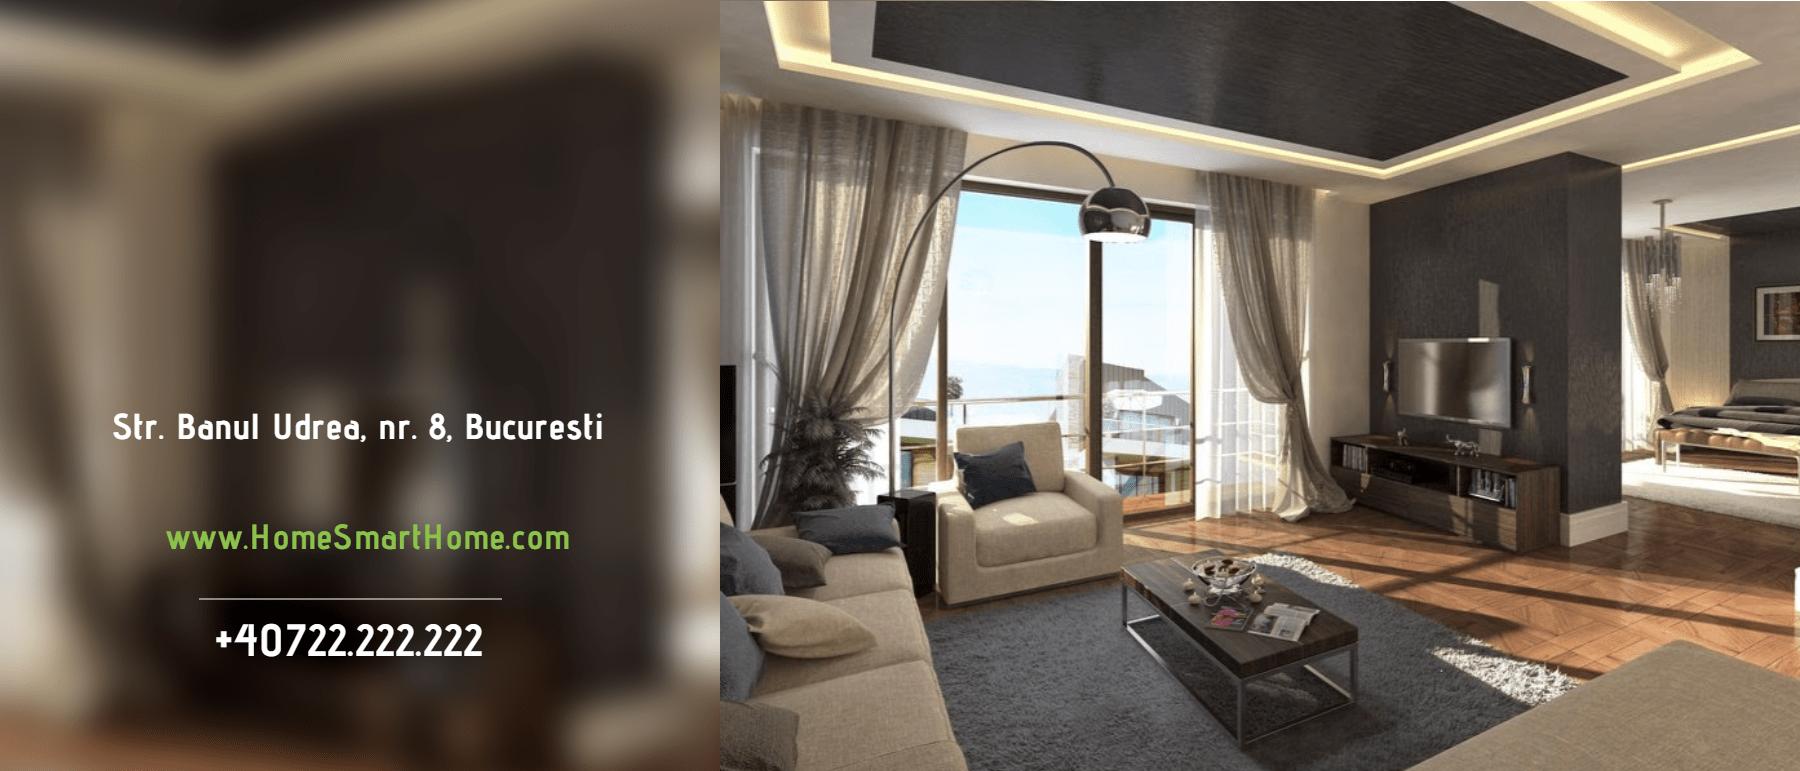 Property,                Interior,                Design,                Real,                Estate,                Home,                Window,                White,                Black,                 Free Image